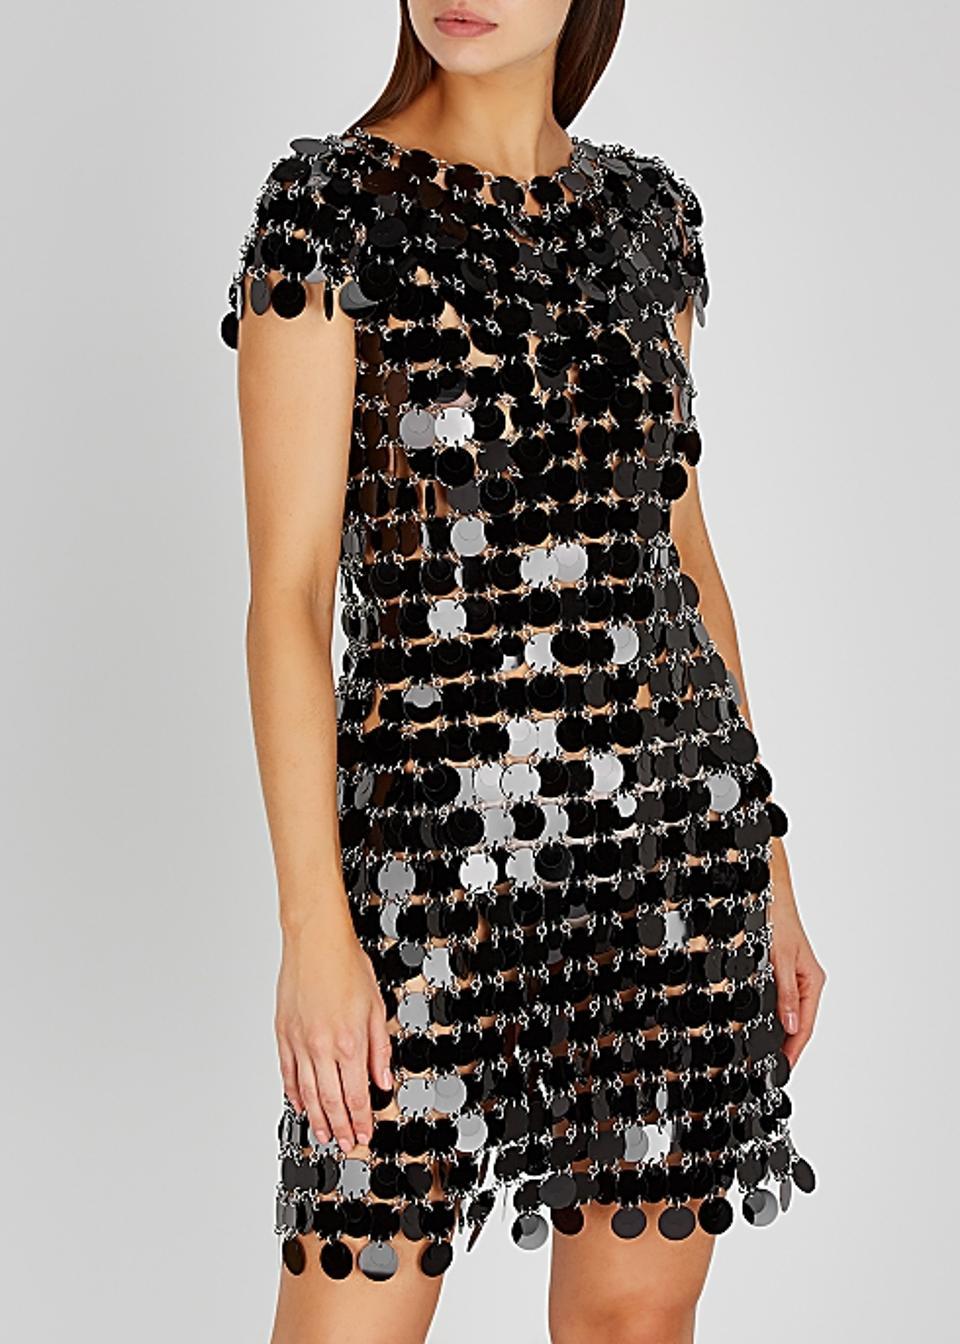 Black Paillette Dress by Paco Rabanne